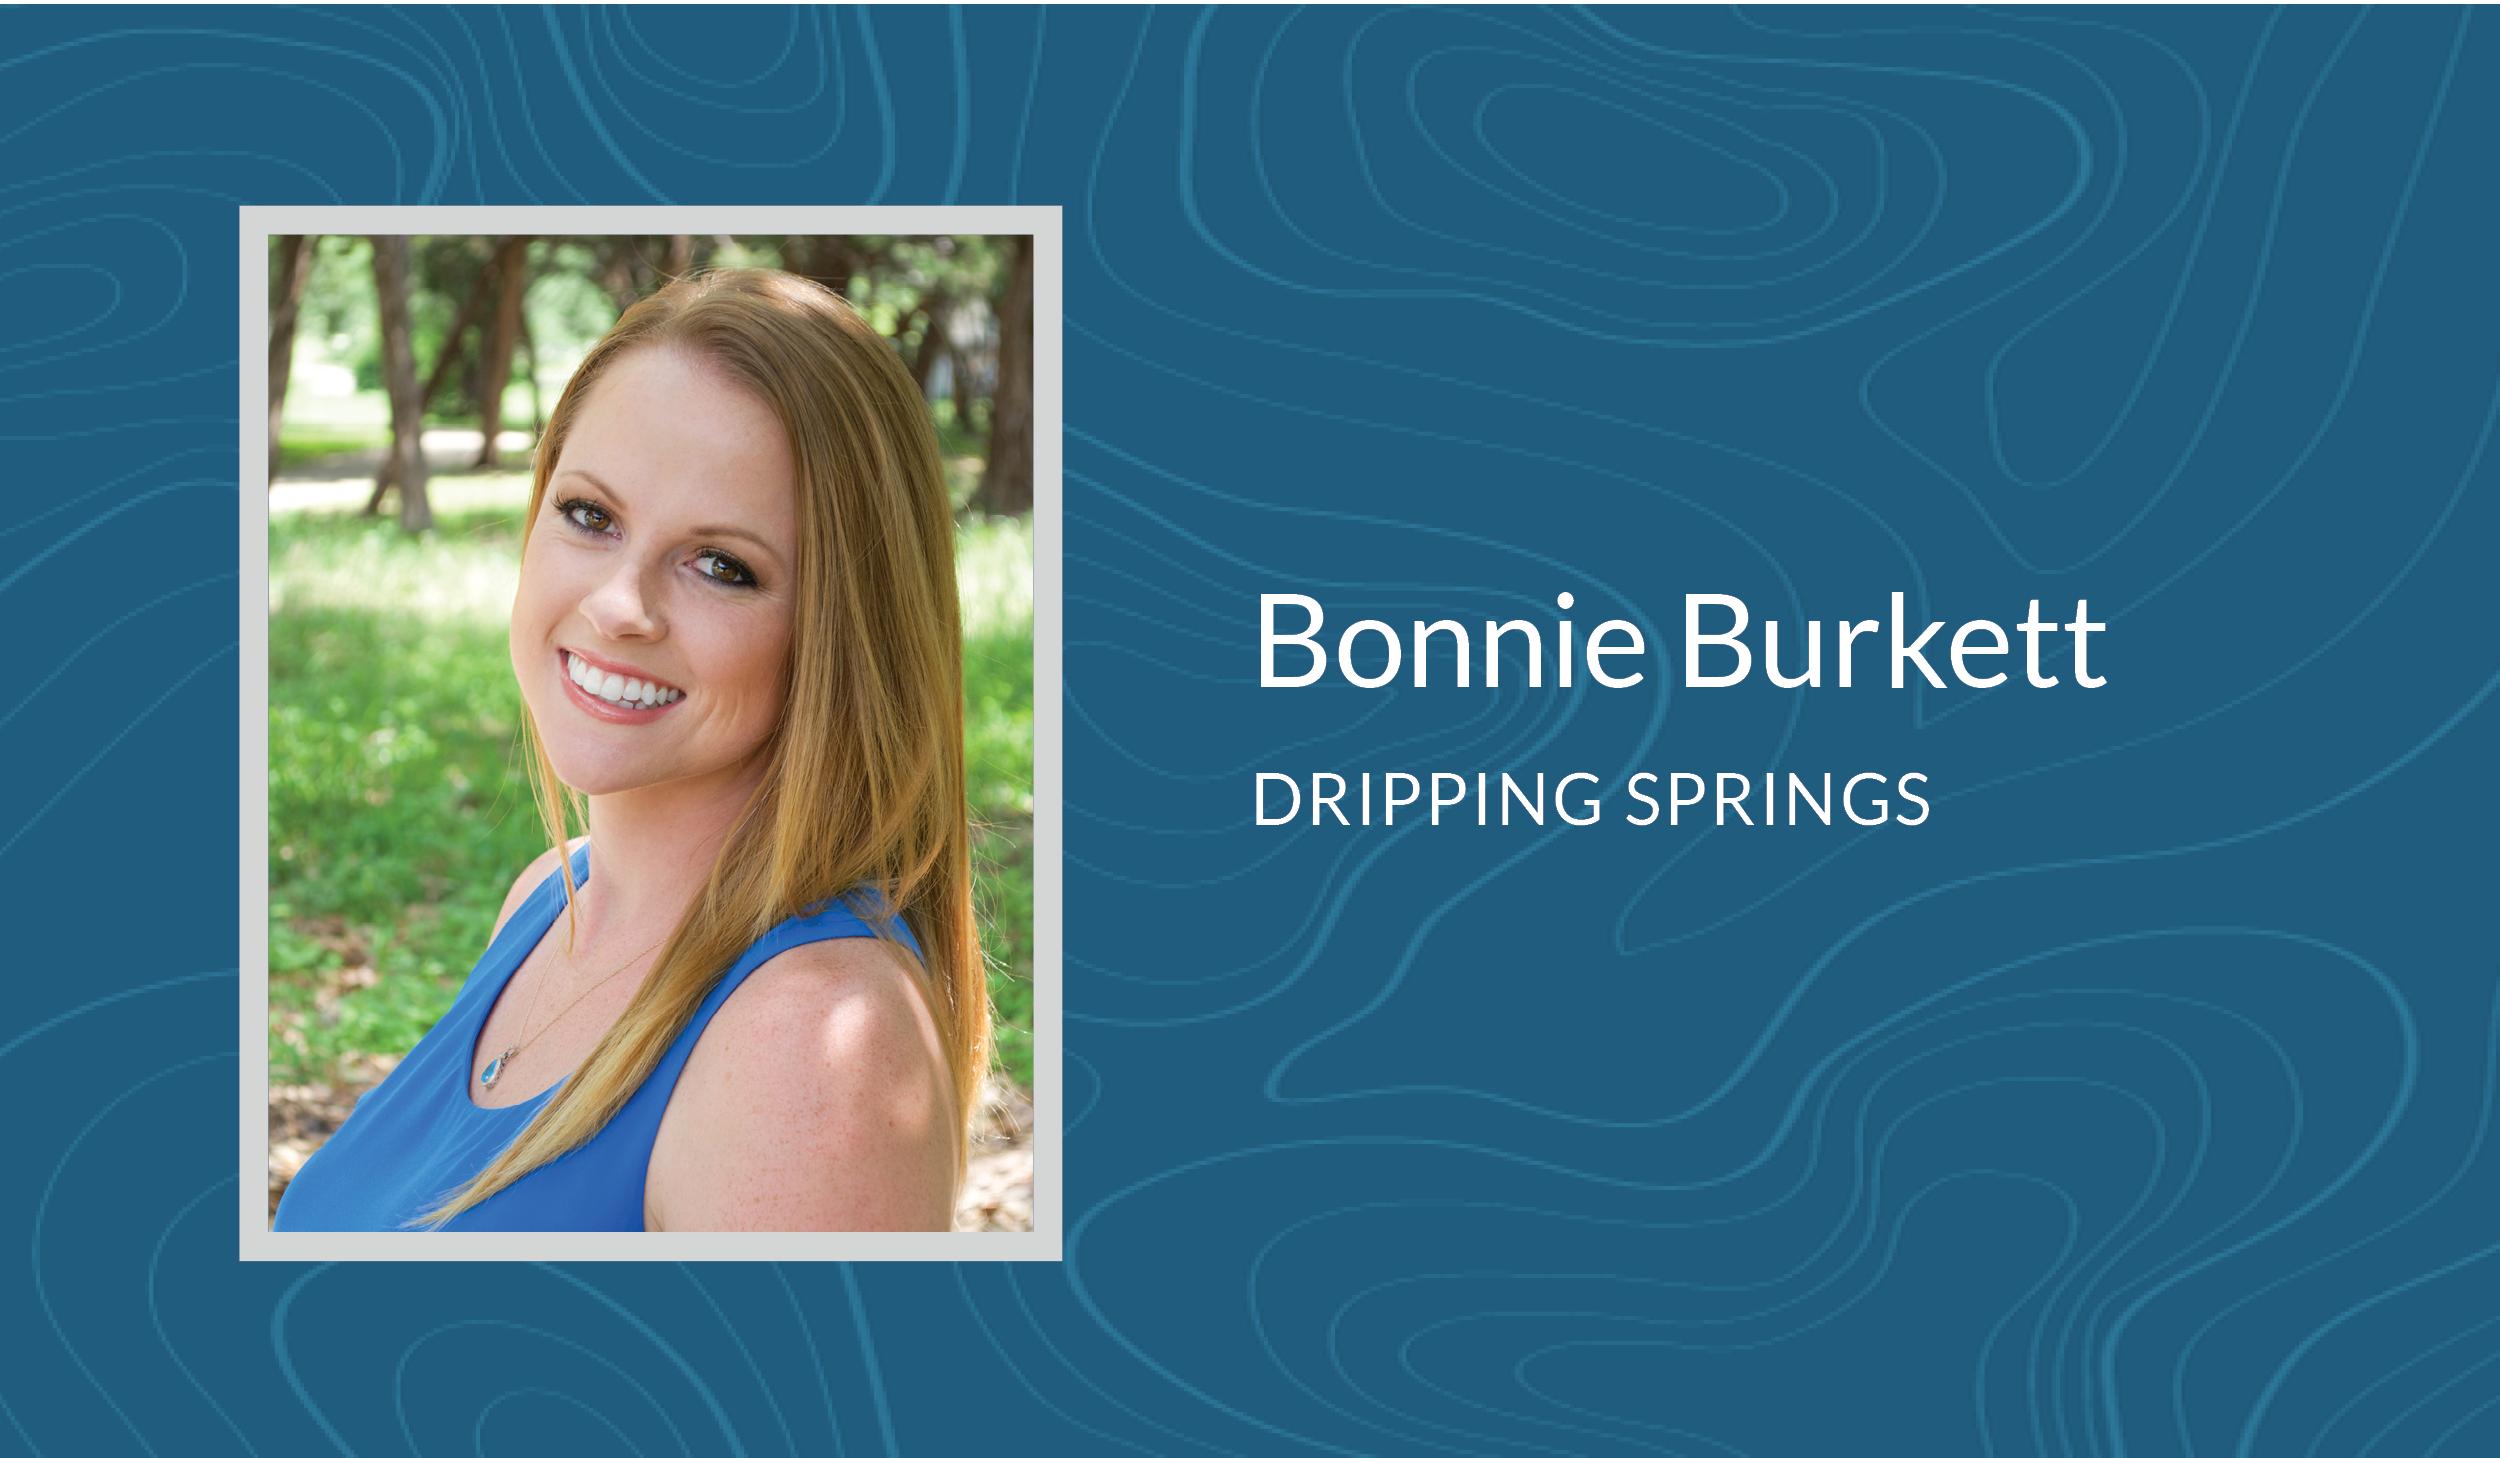 Bonnie Burkett Landing Page Header.png